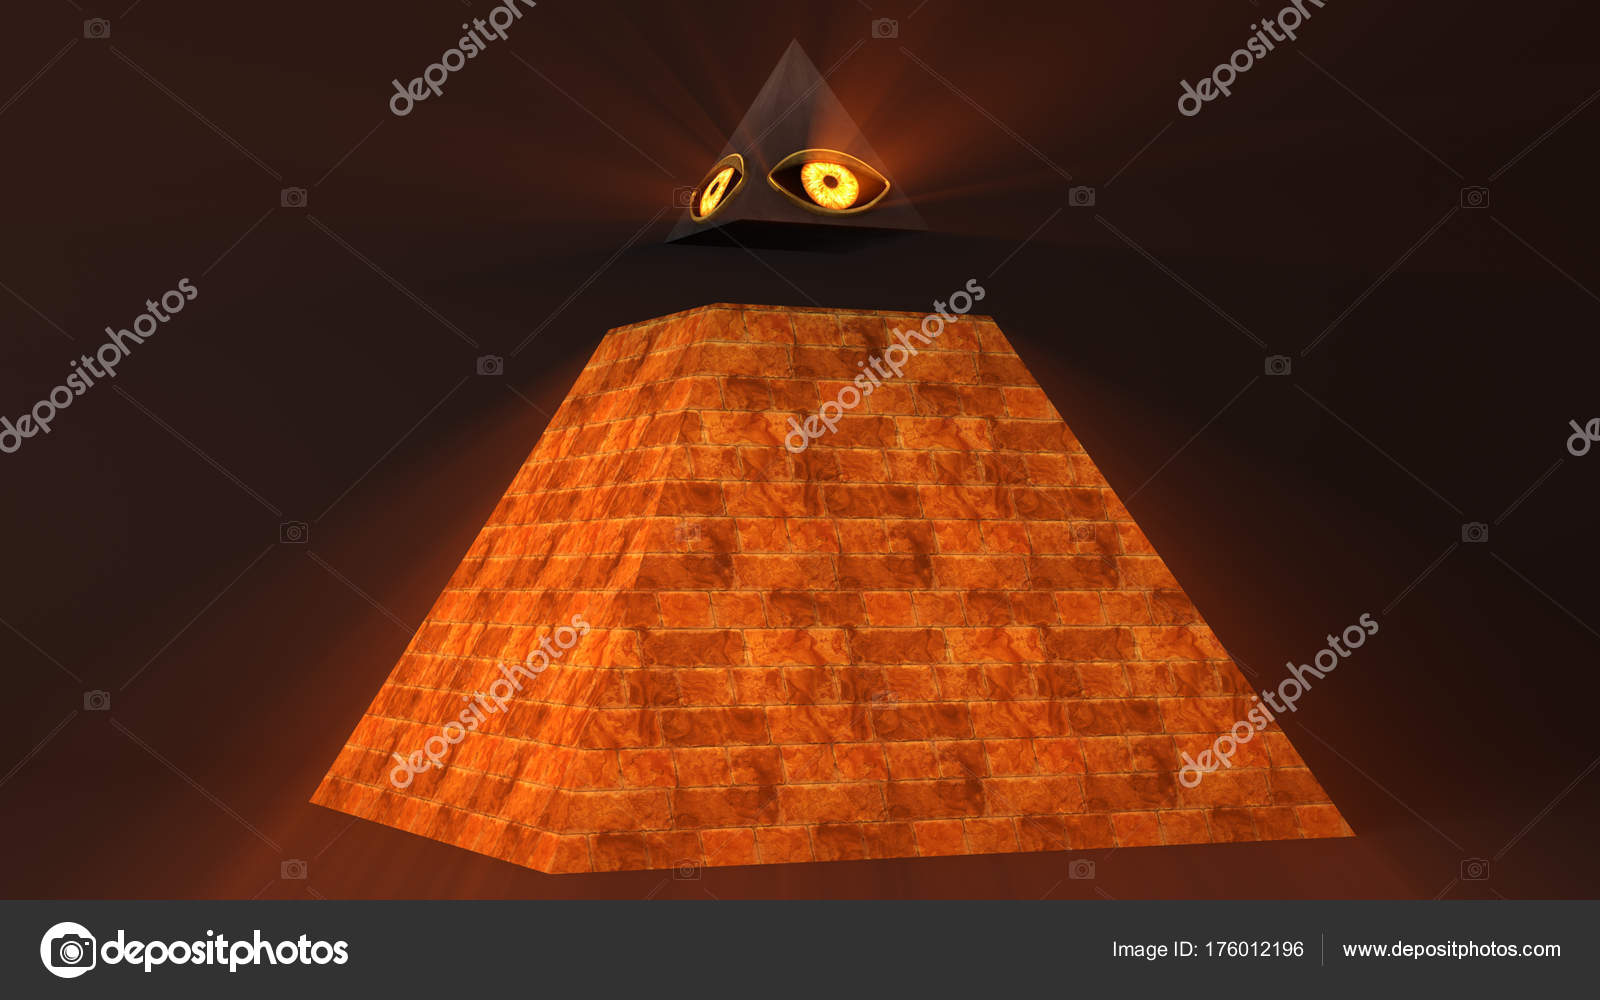 All Seeing Eye Of God The Providence Pyramid Illuminati Symbol 3D Illustration Photo By Boscorelli